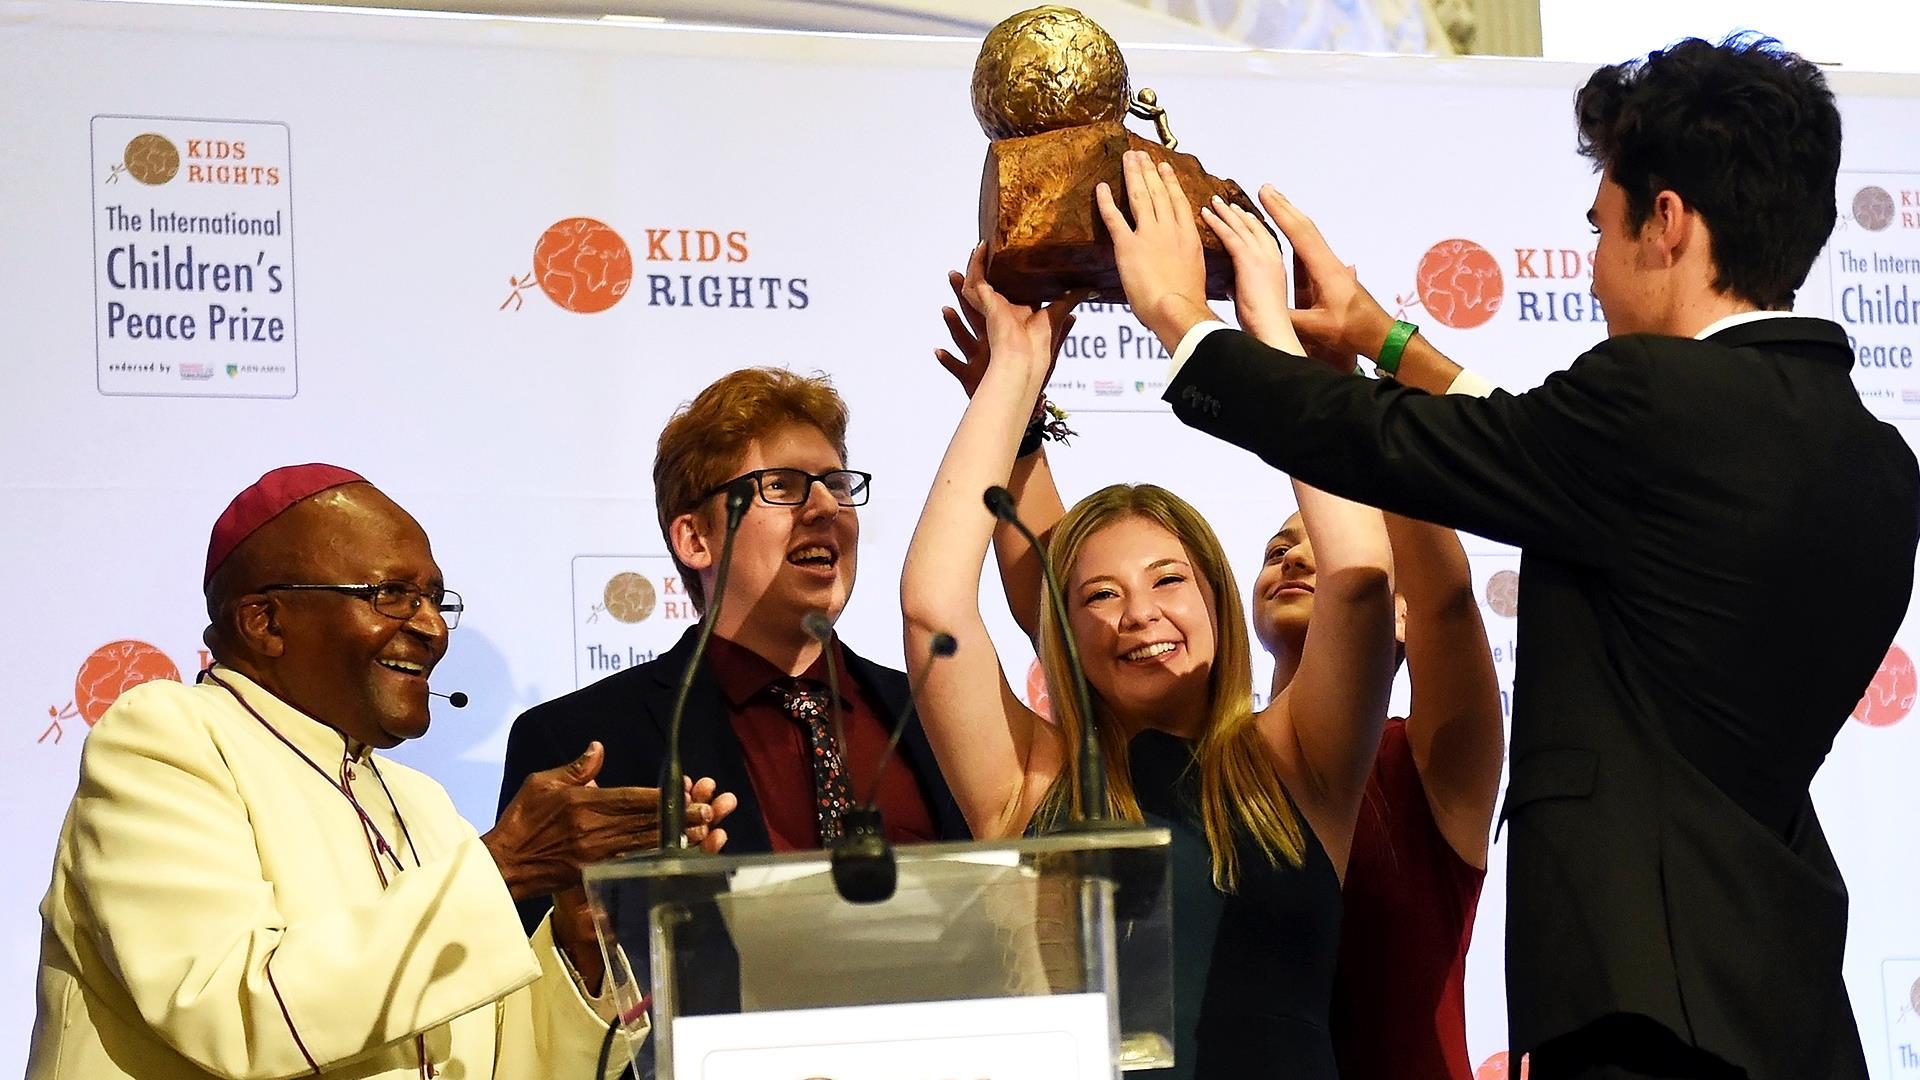 Parkland shooting survivors awarded International Children's Peace Prize